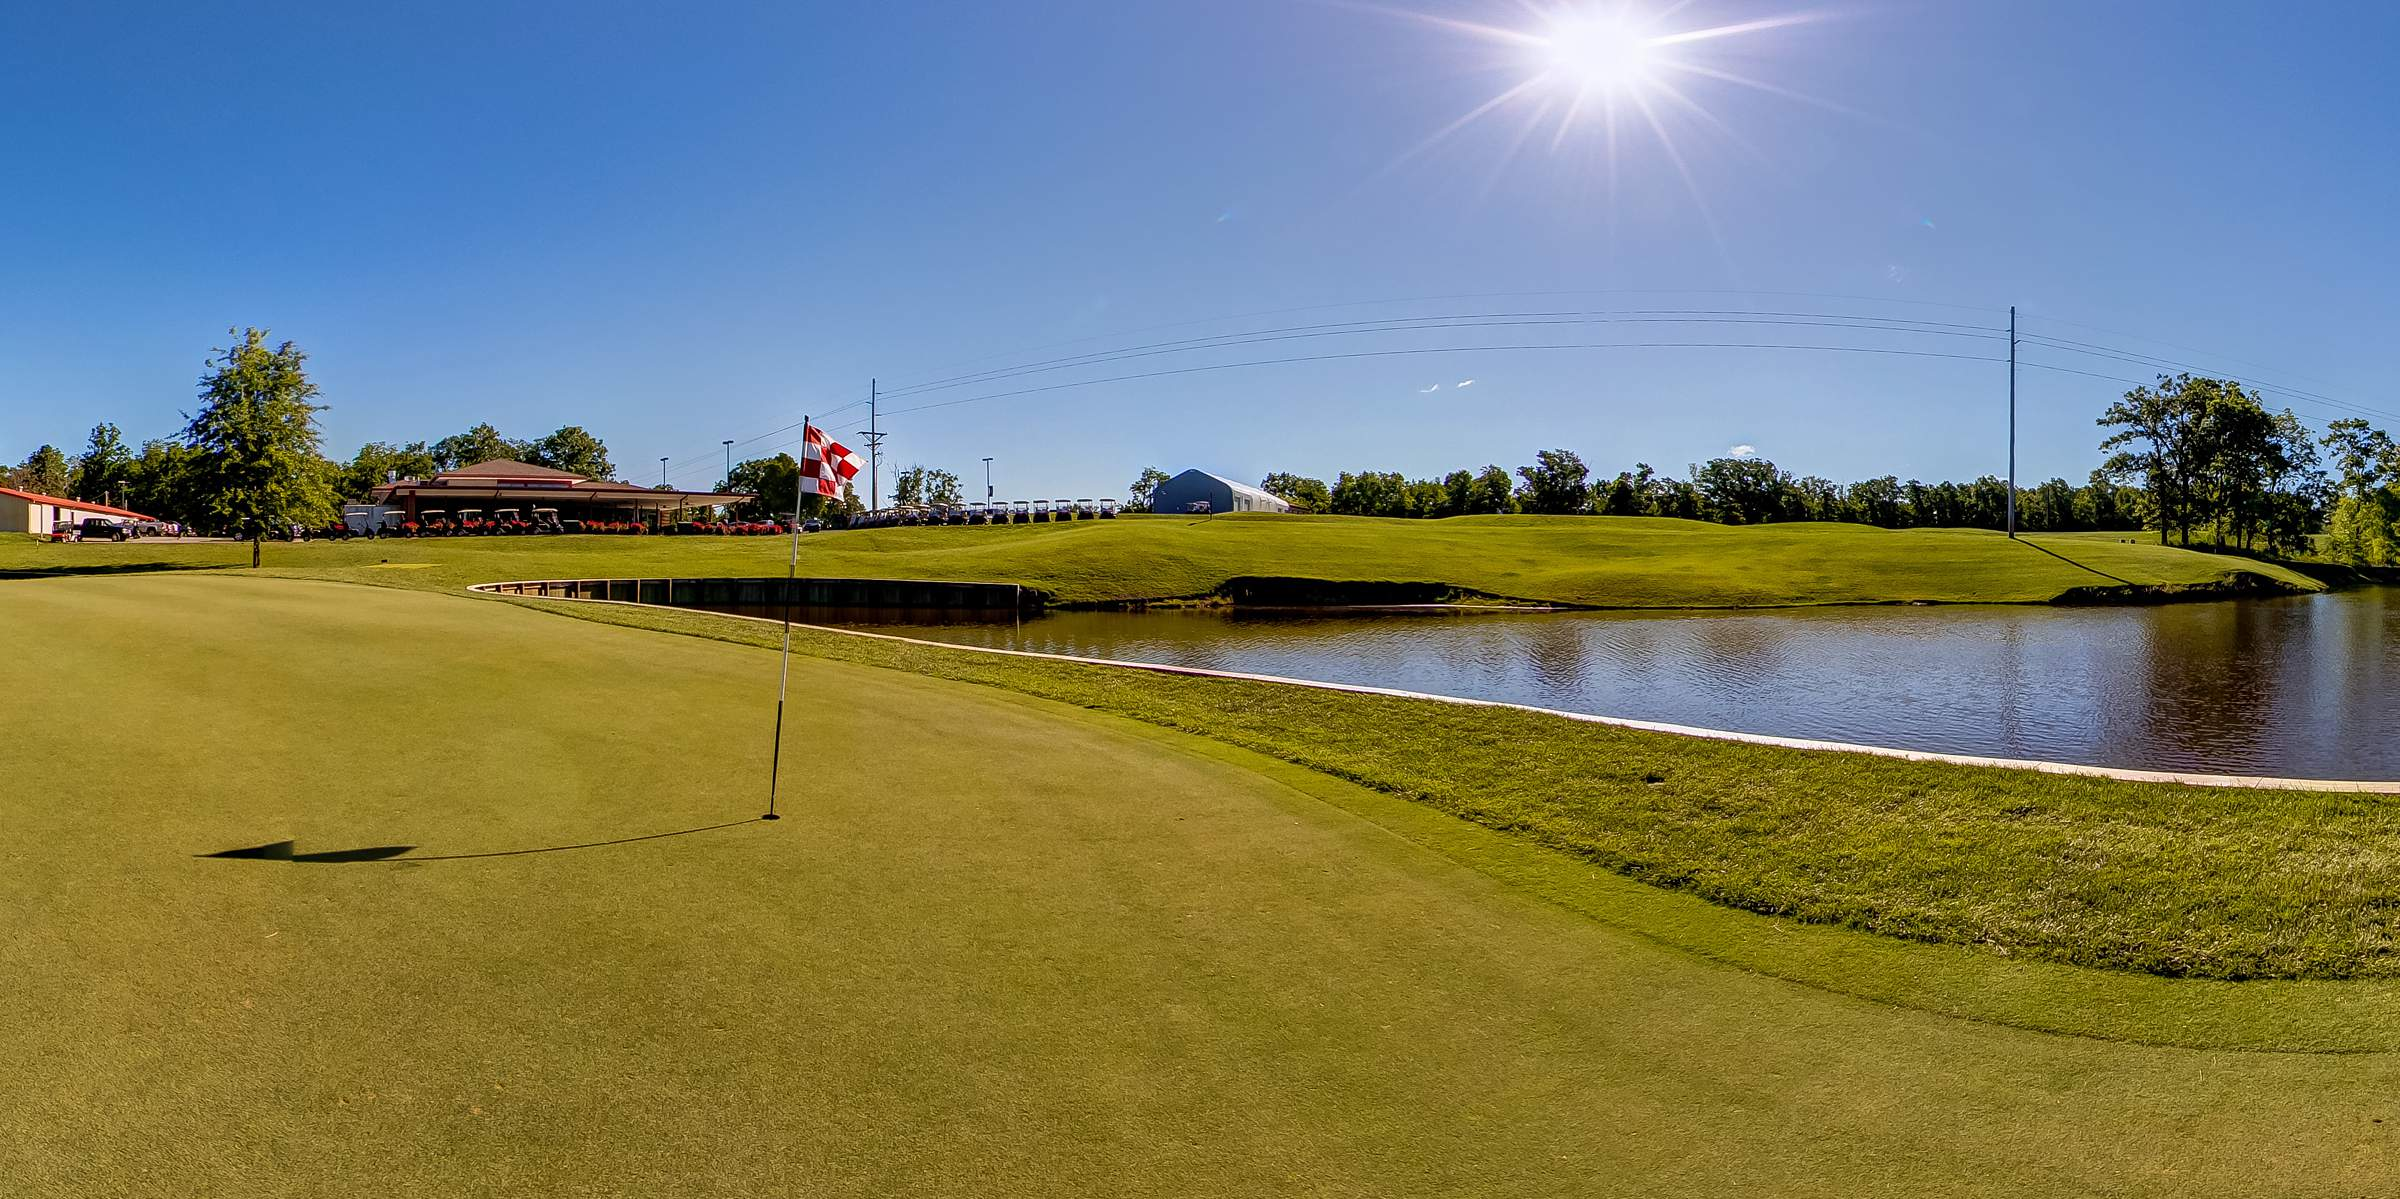 Virtual Tour Golf Course Google Maps 360 WALKTHRU